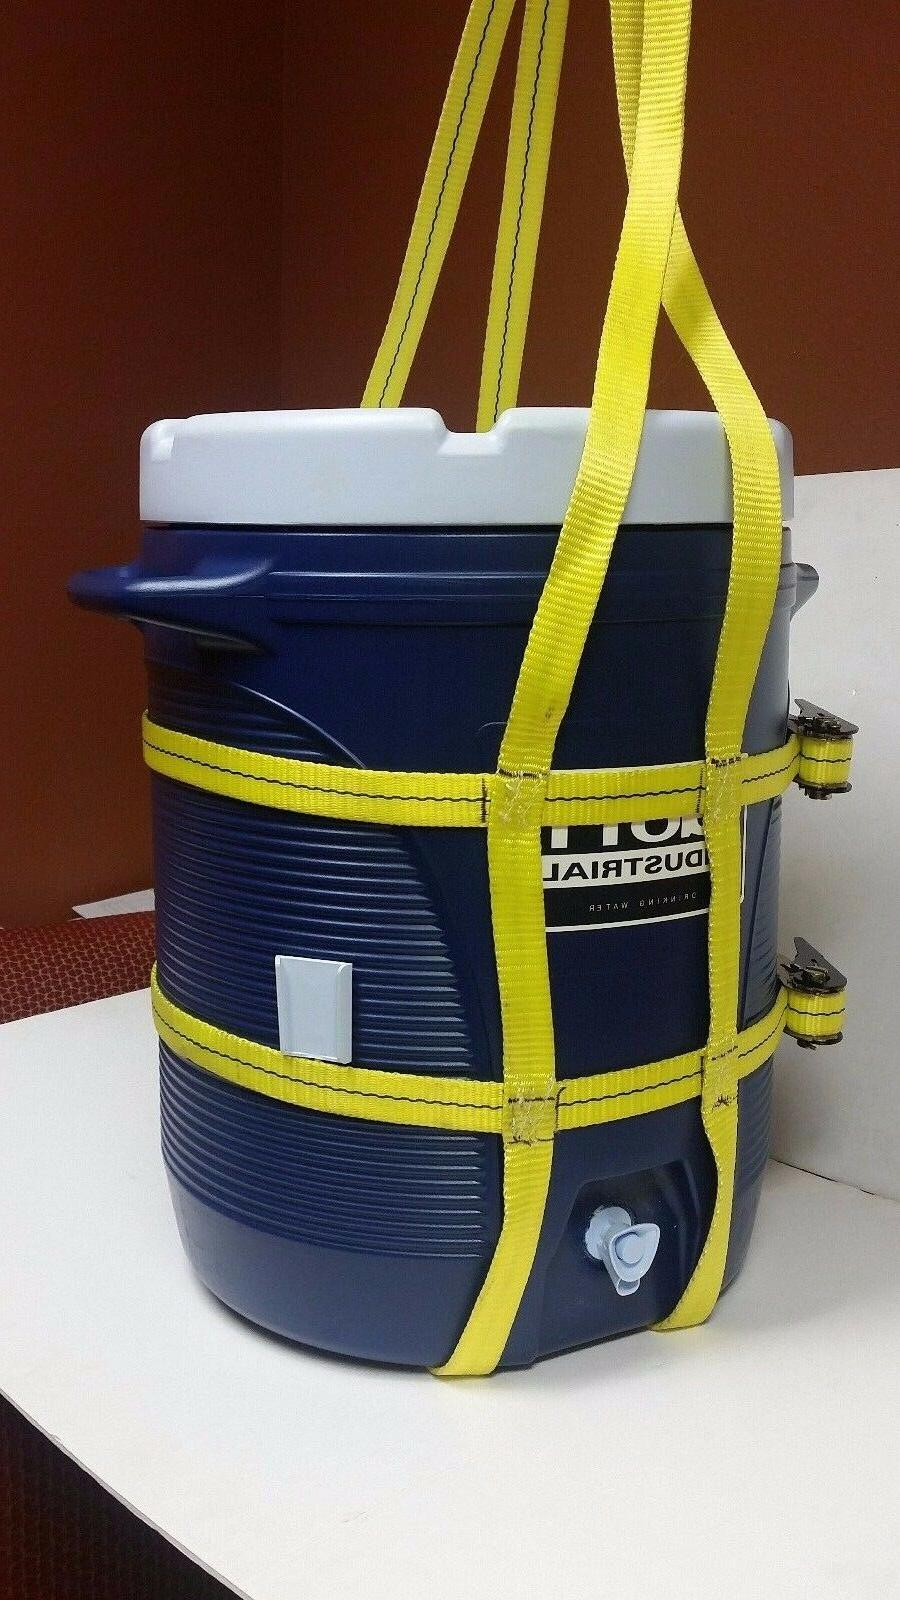 Trident & Cooler Lifting Lifting Strap